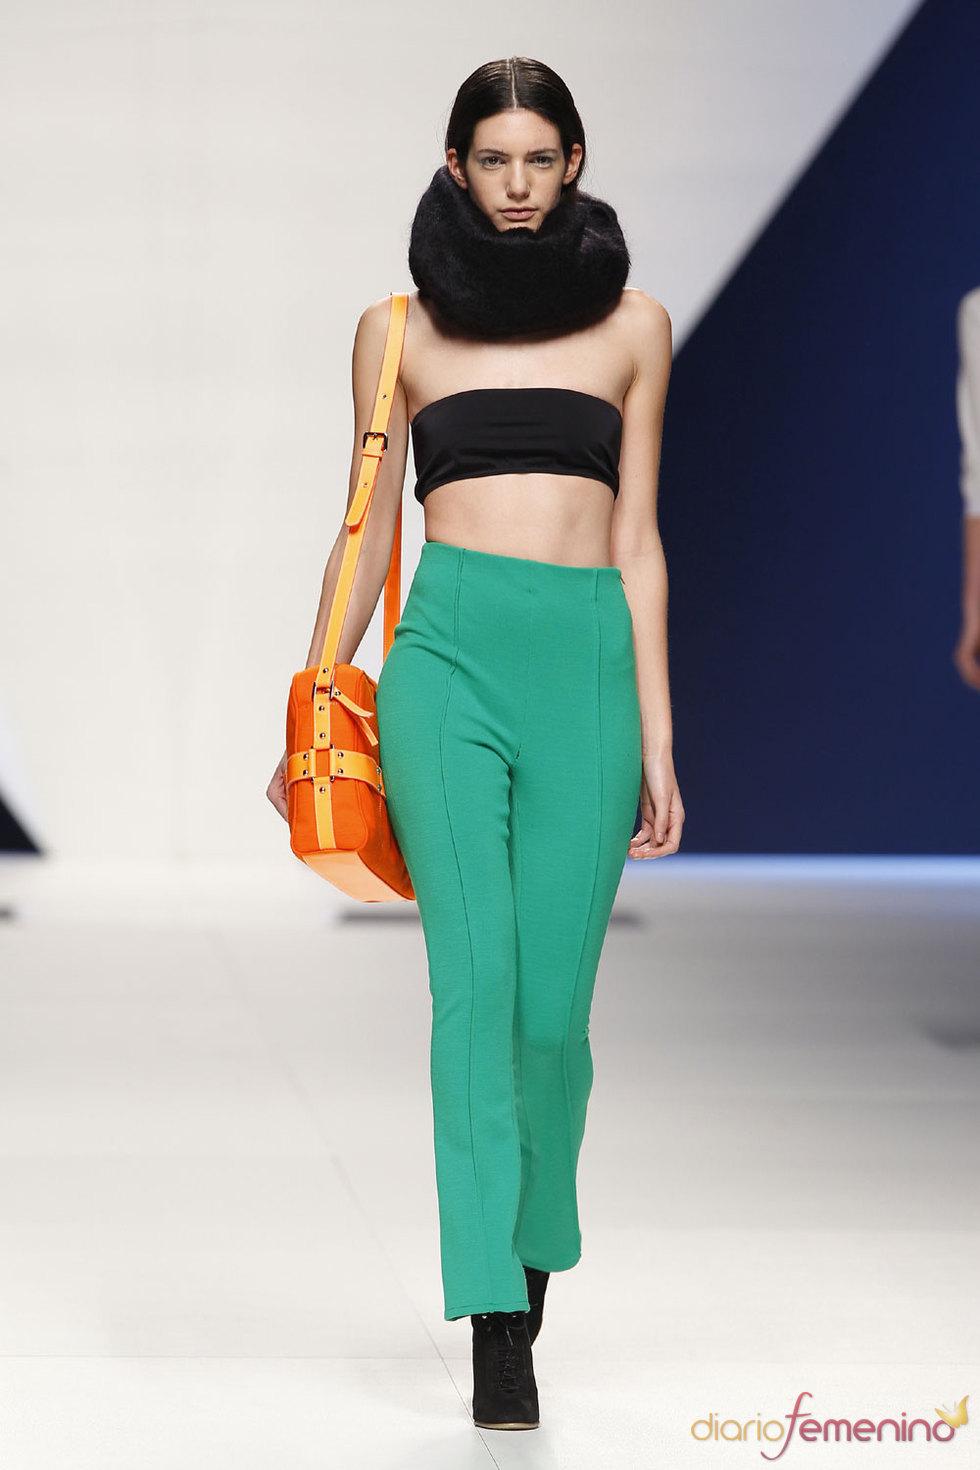 Moda Femenina - Carlos Doblas - Cibeles Madrid Fashion Week 2010